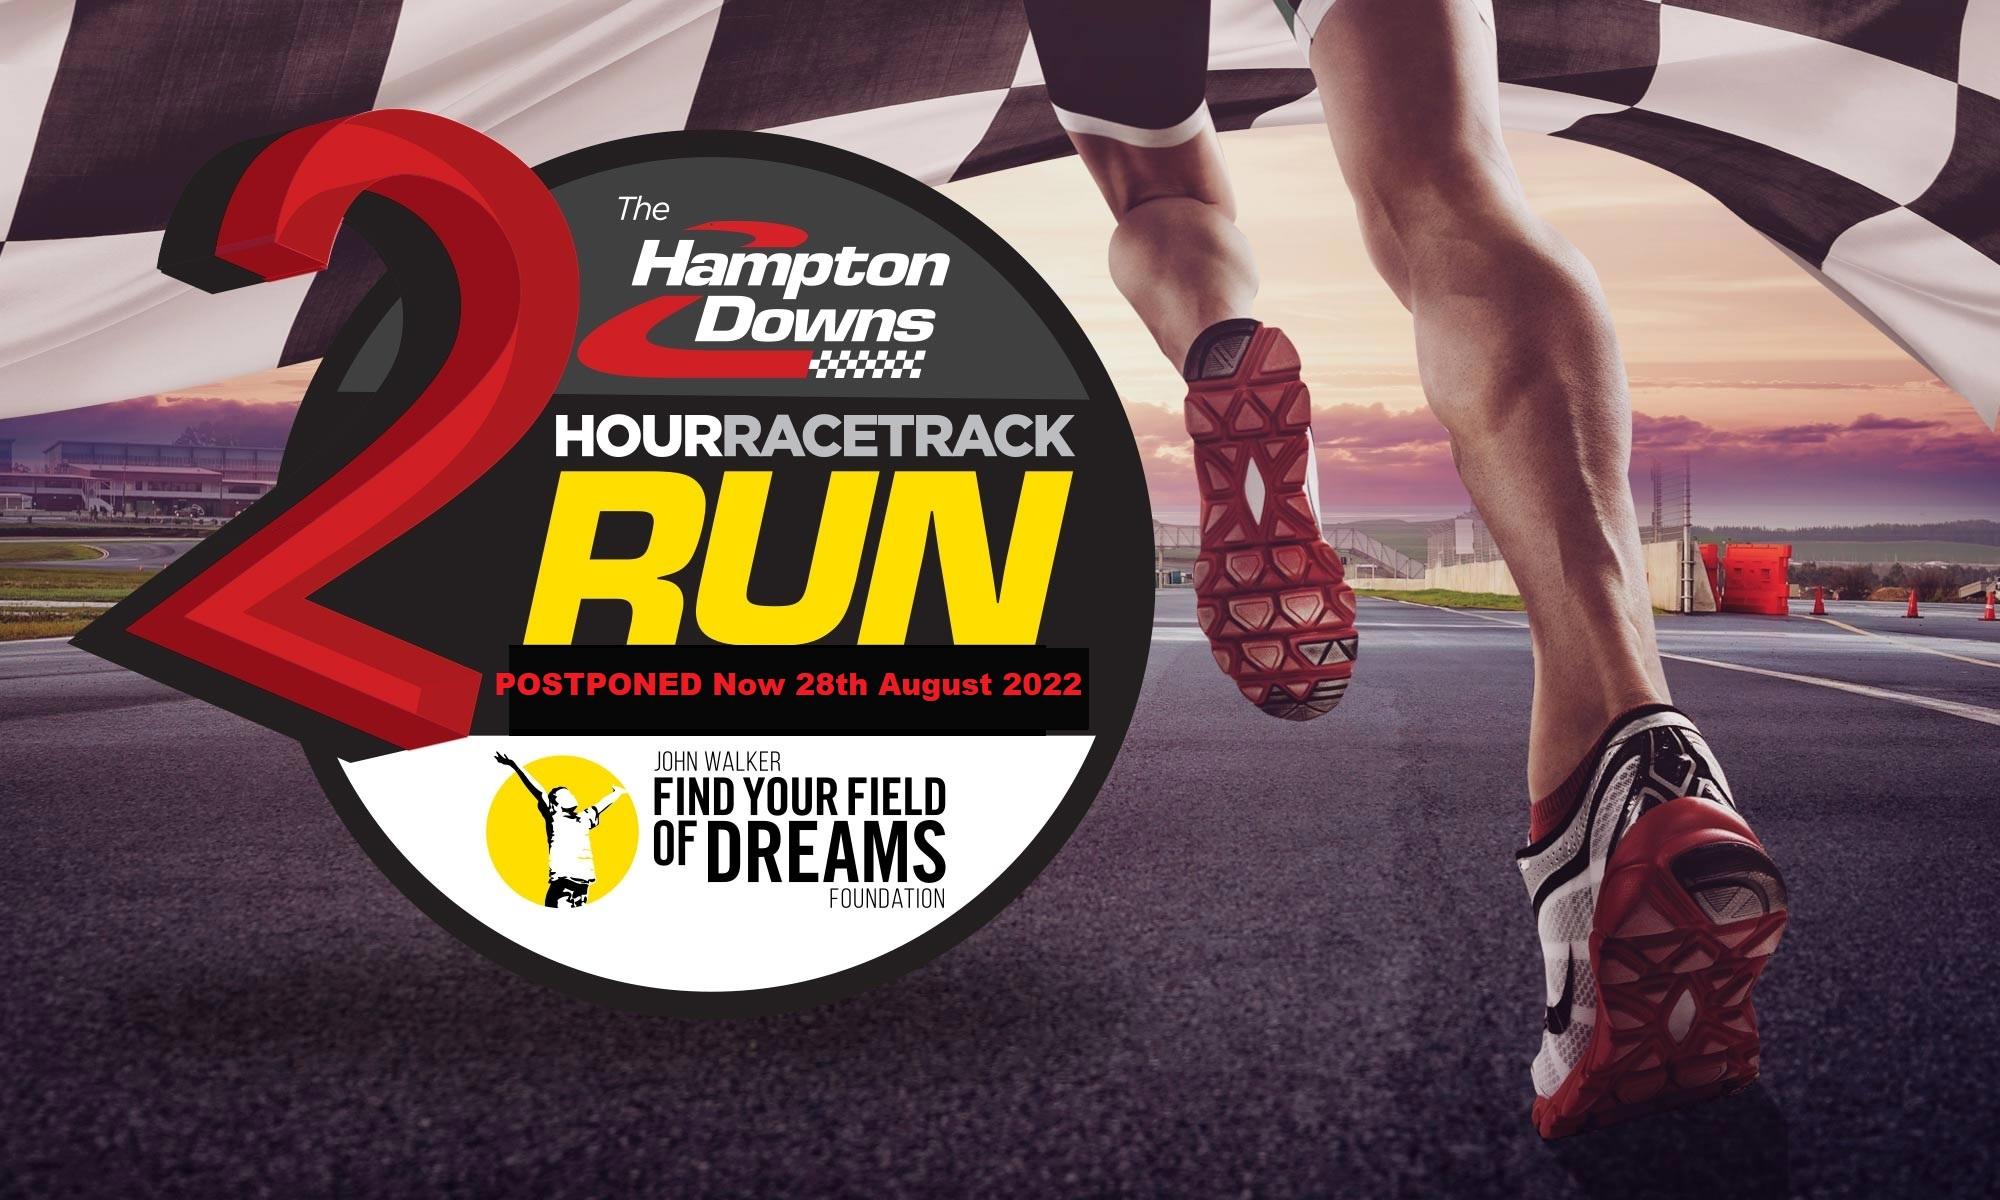 Hampton Downs Race Track Run Postponed – Now 28th August 2022